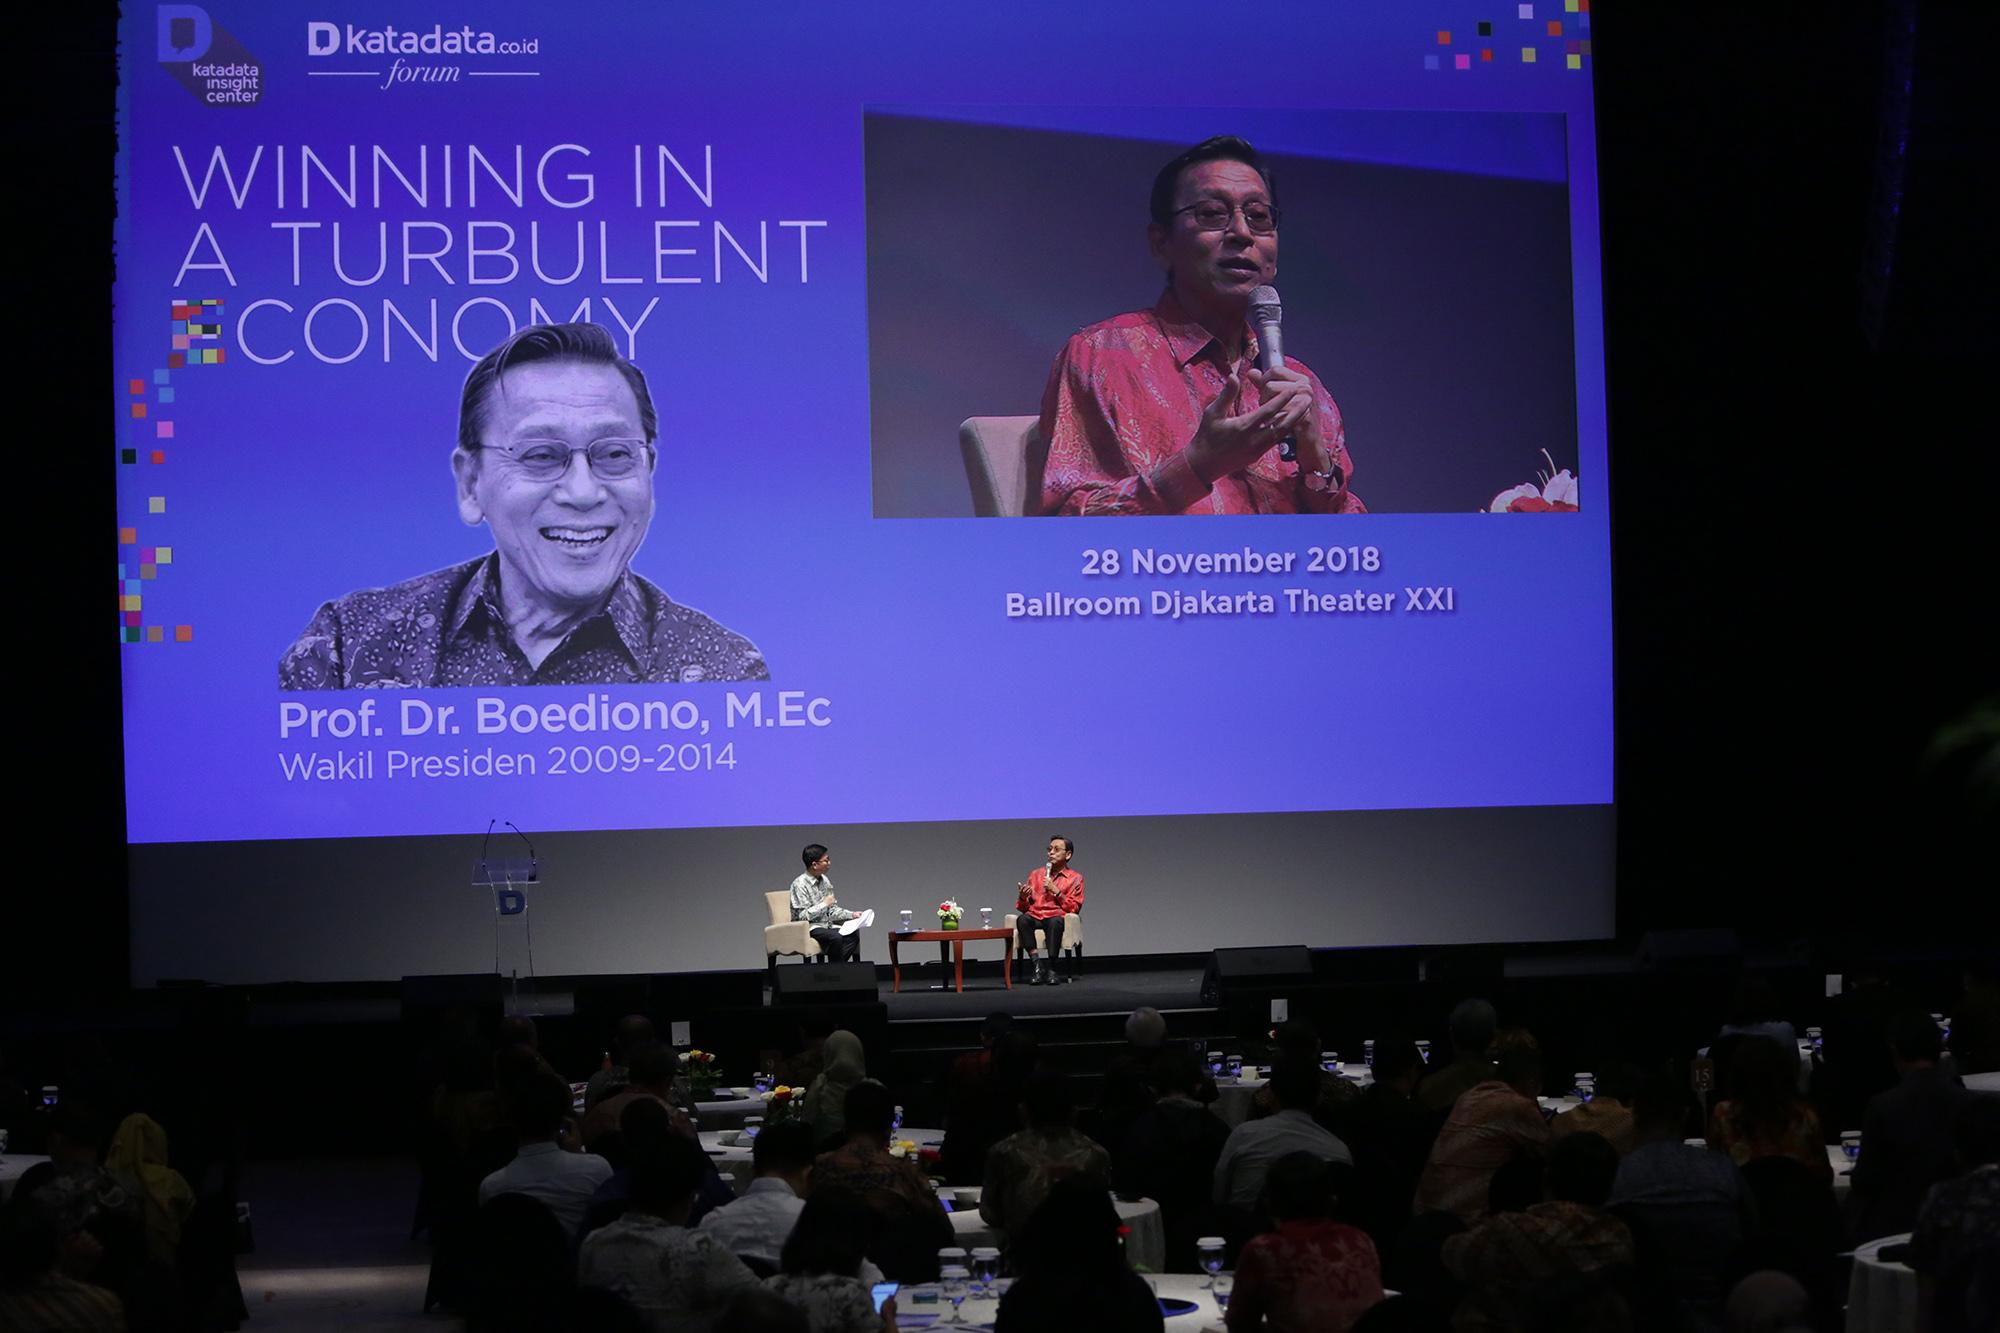 Katadata Forum 2018